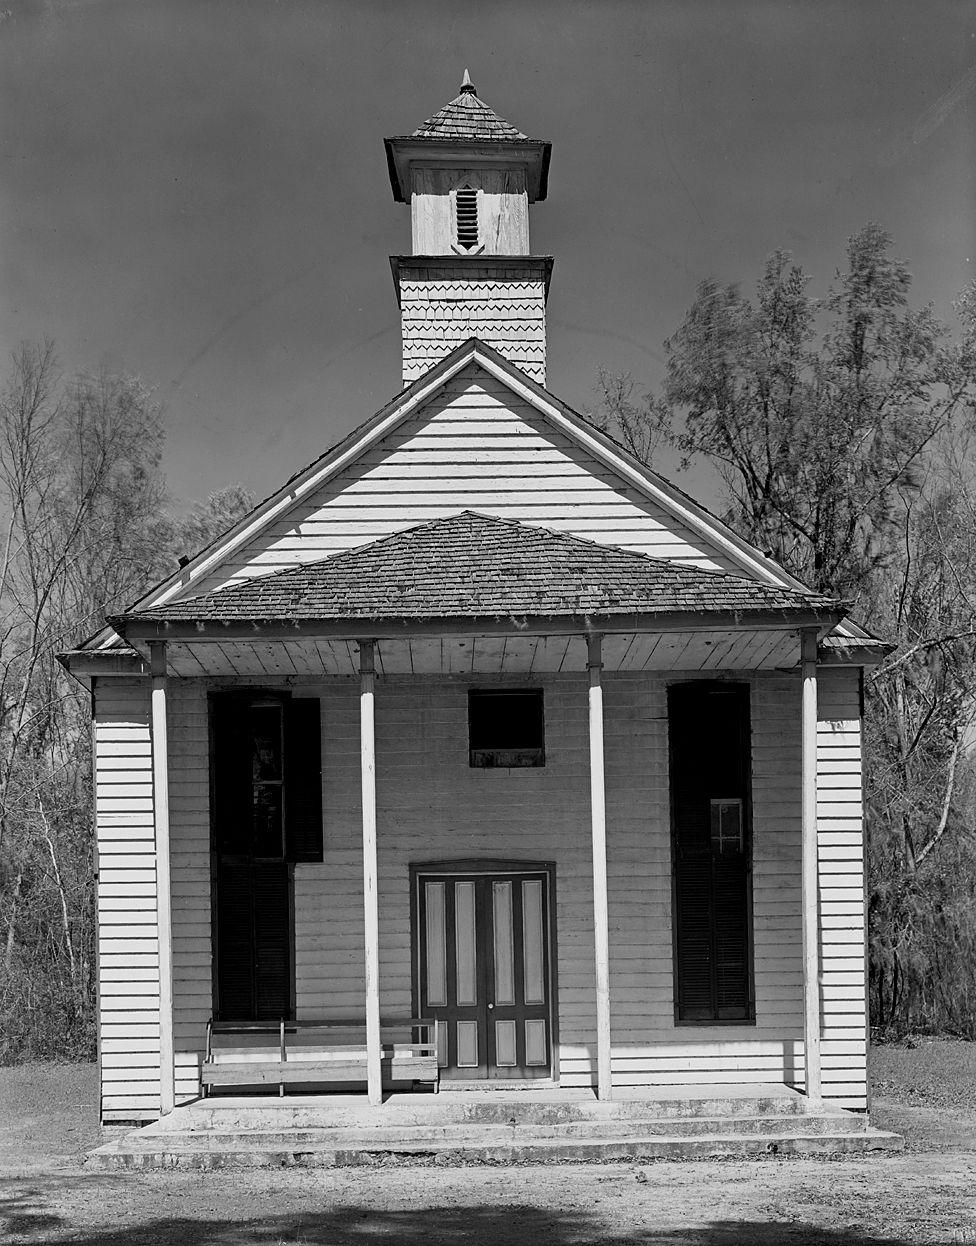 Church in South Carolina, USA - 1936 (photo by Walker Evans)